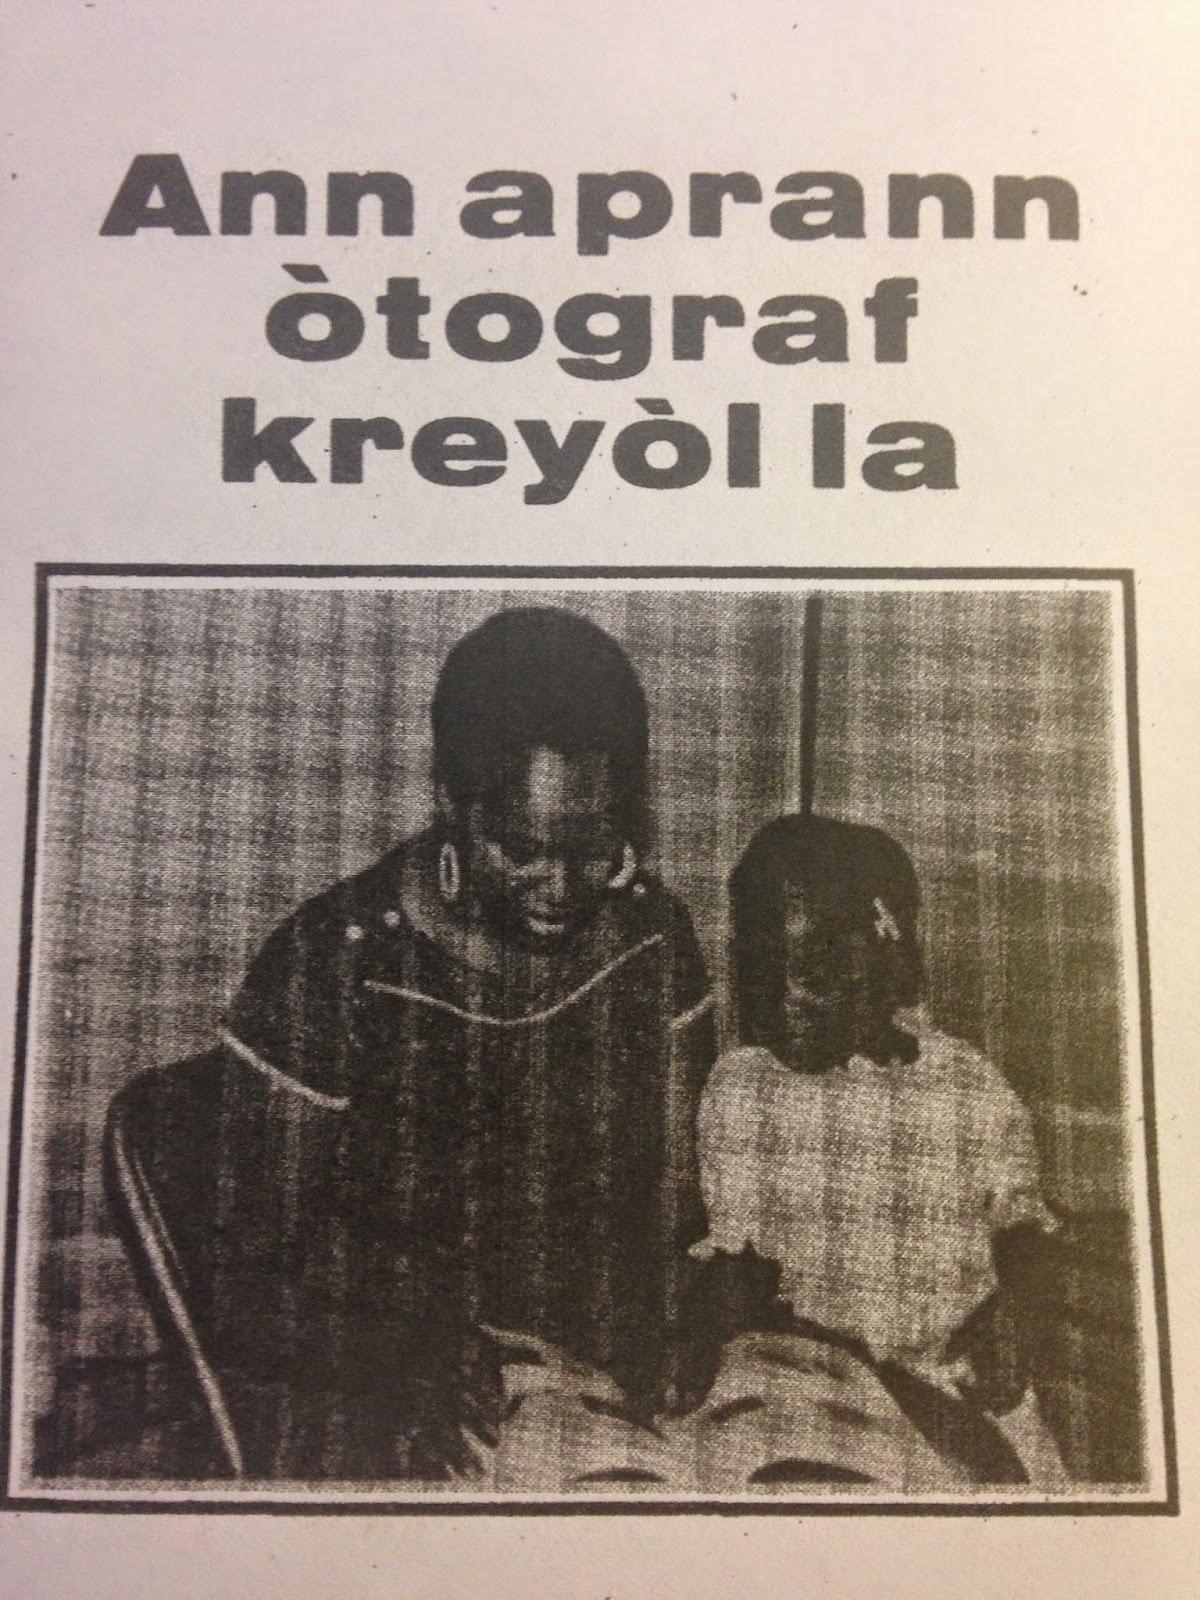 Haitian Creole Aprann Otograf Kreyol La